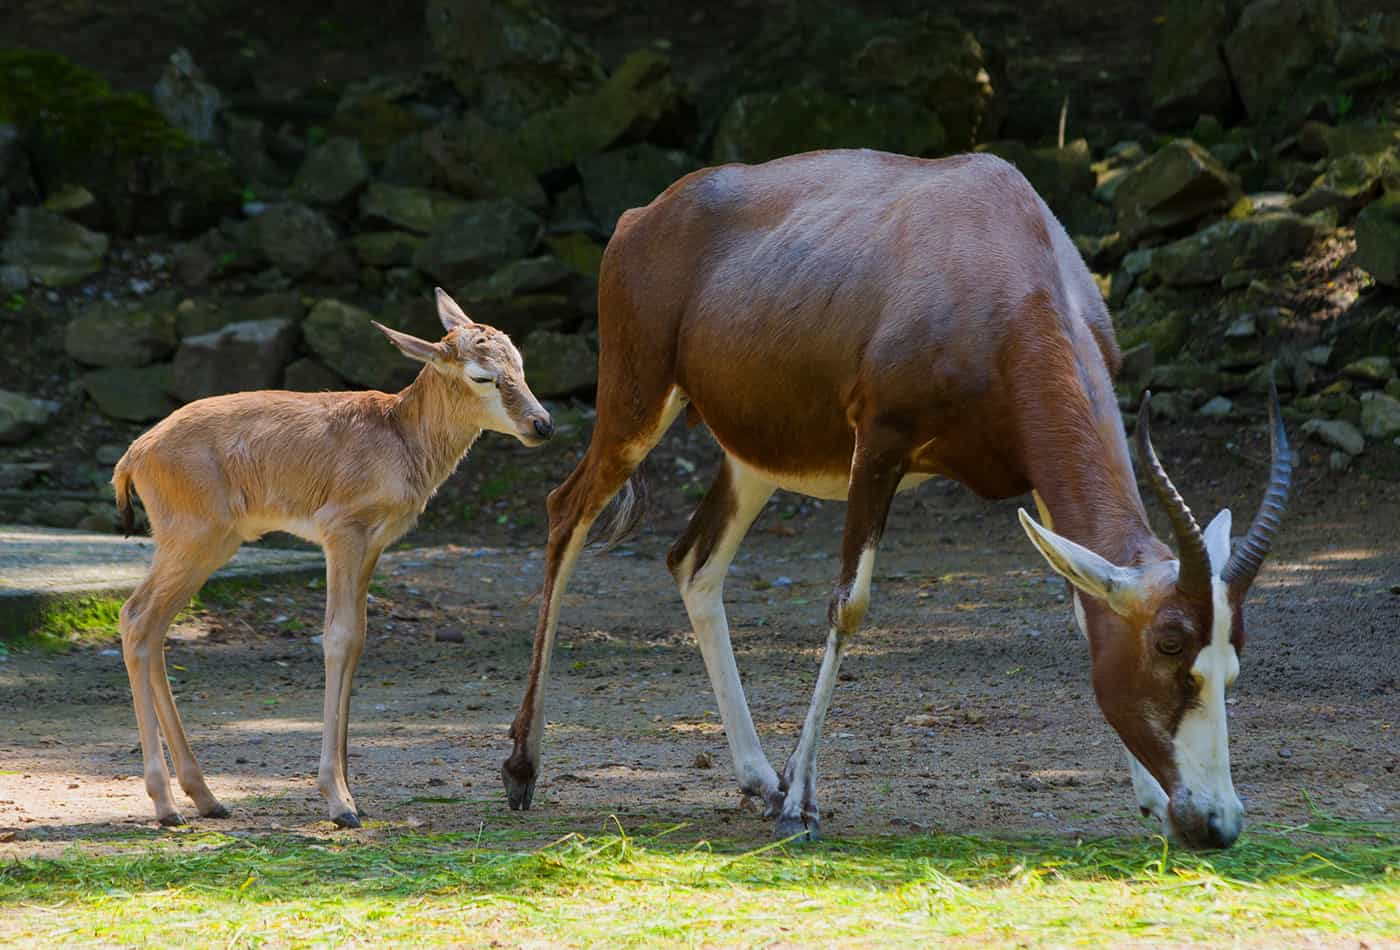 Mutter-Kind-Tag im Zoo Heidelberg (Foto: hEidrun Knigge/Zoo Heidelberg)